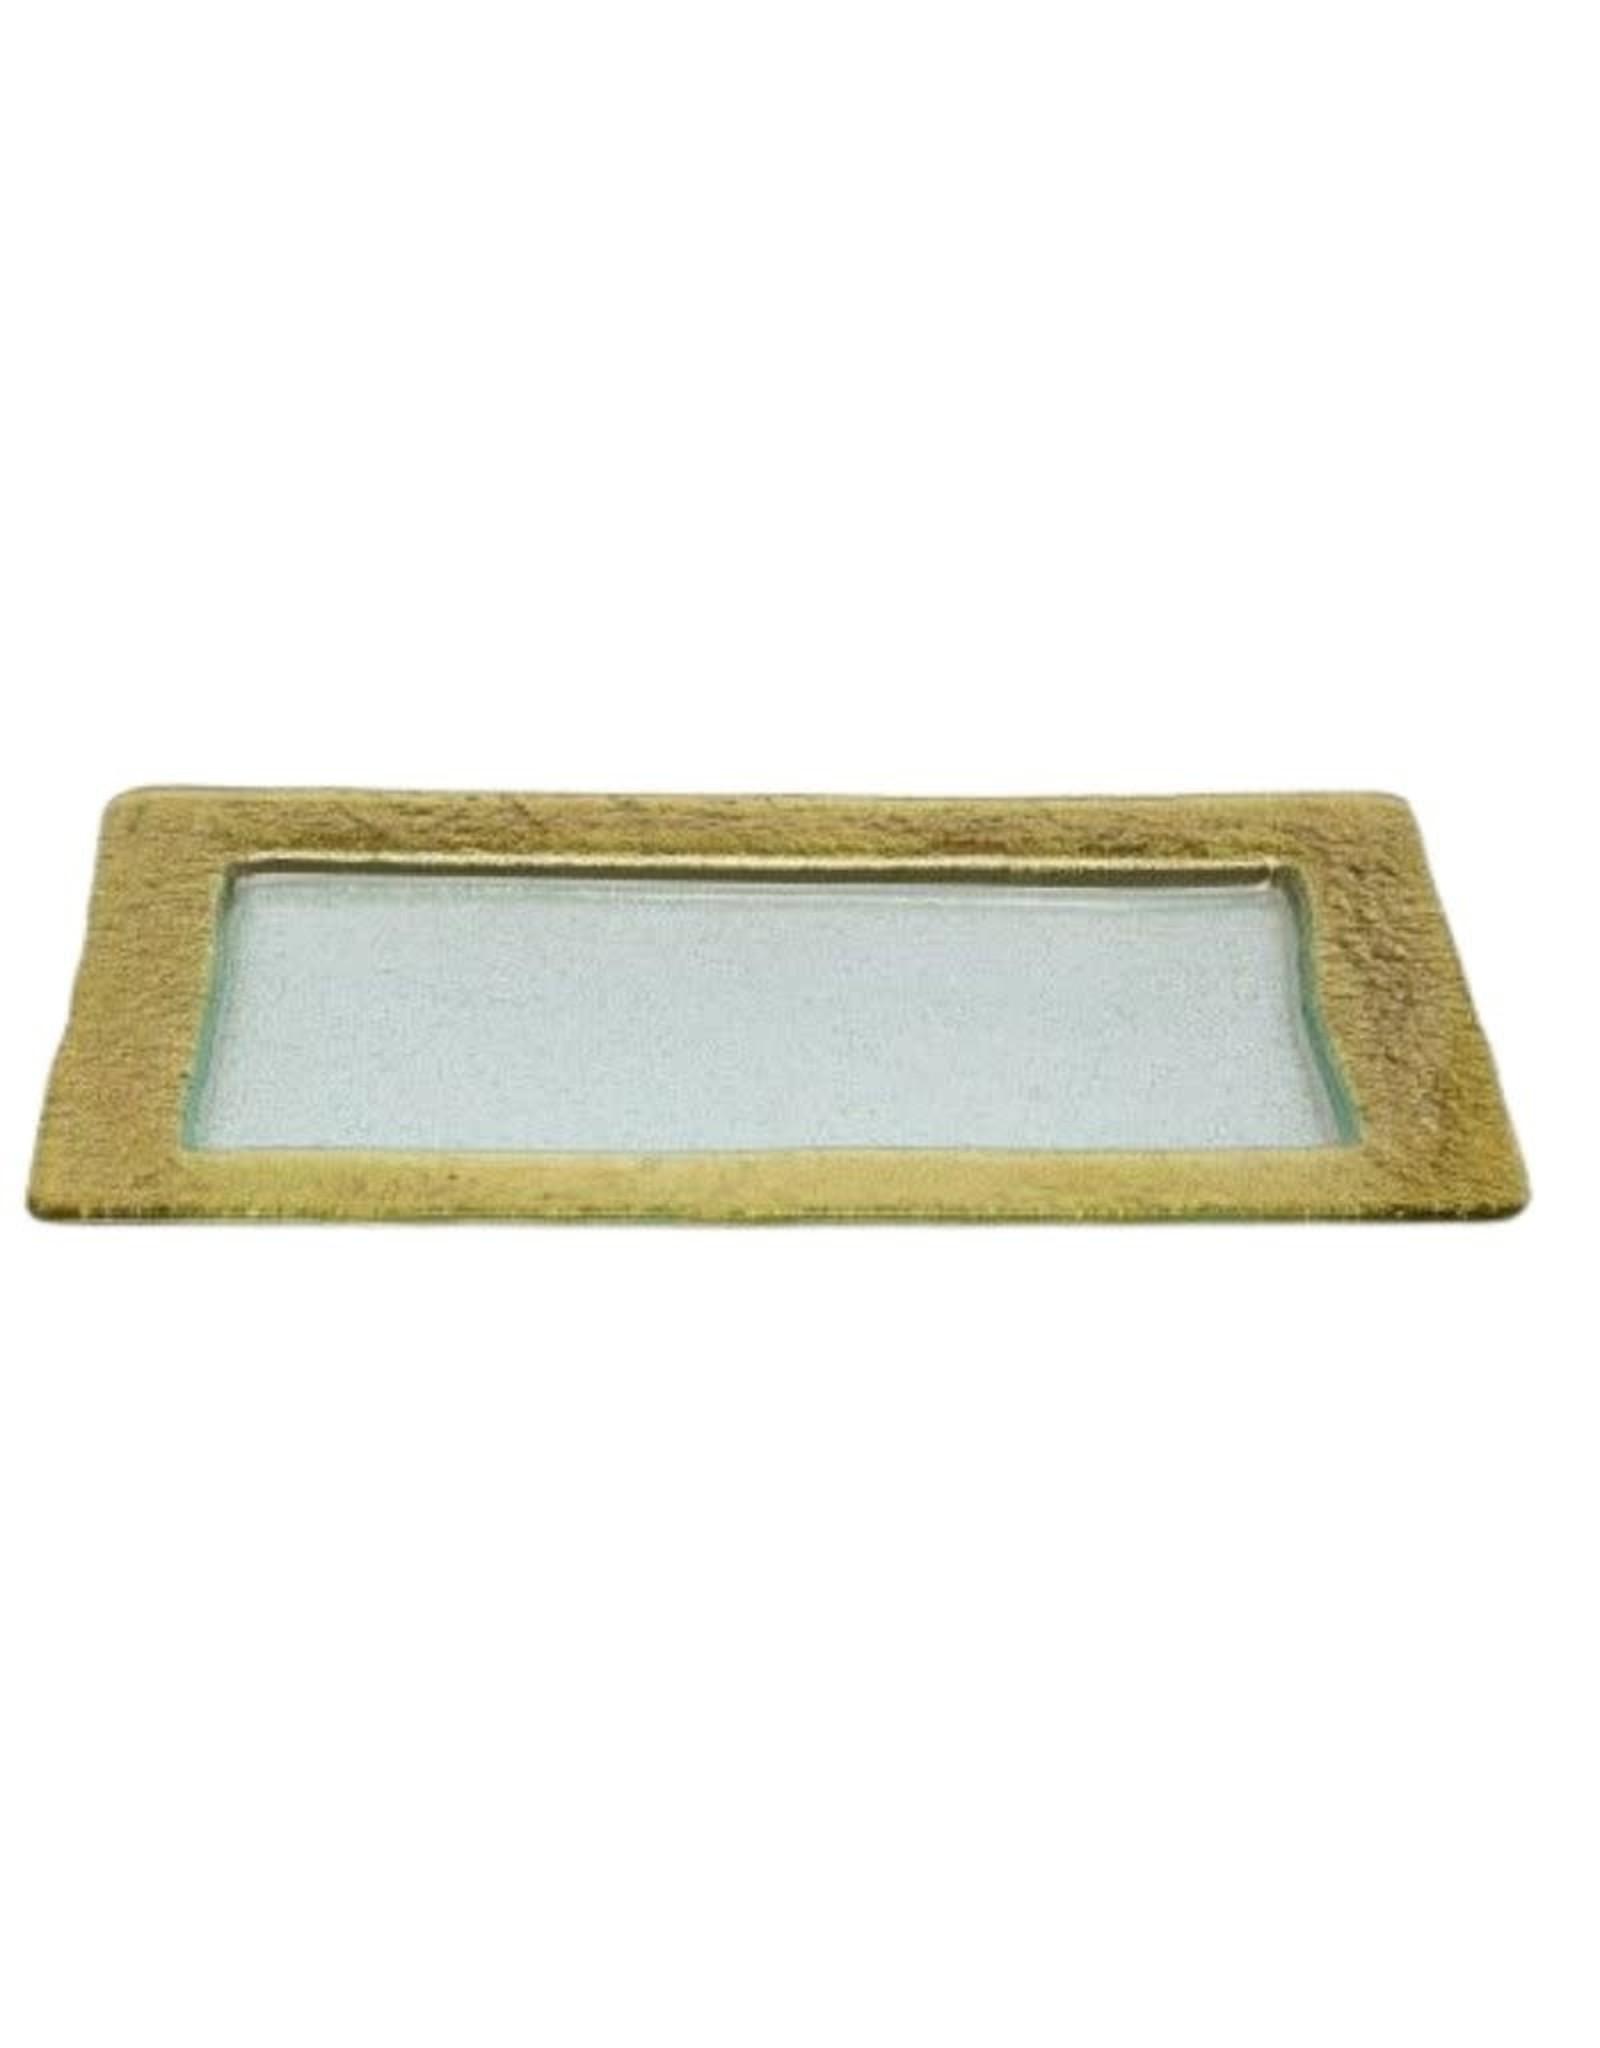 Glass Rectangular Tray Gold Design